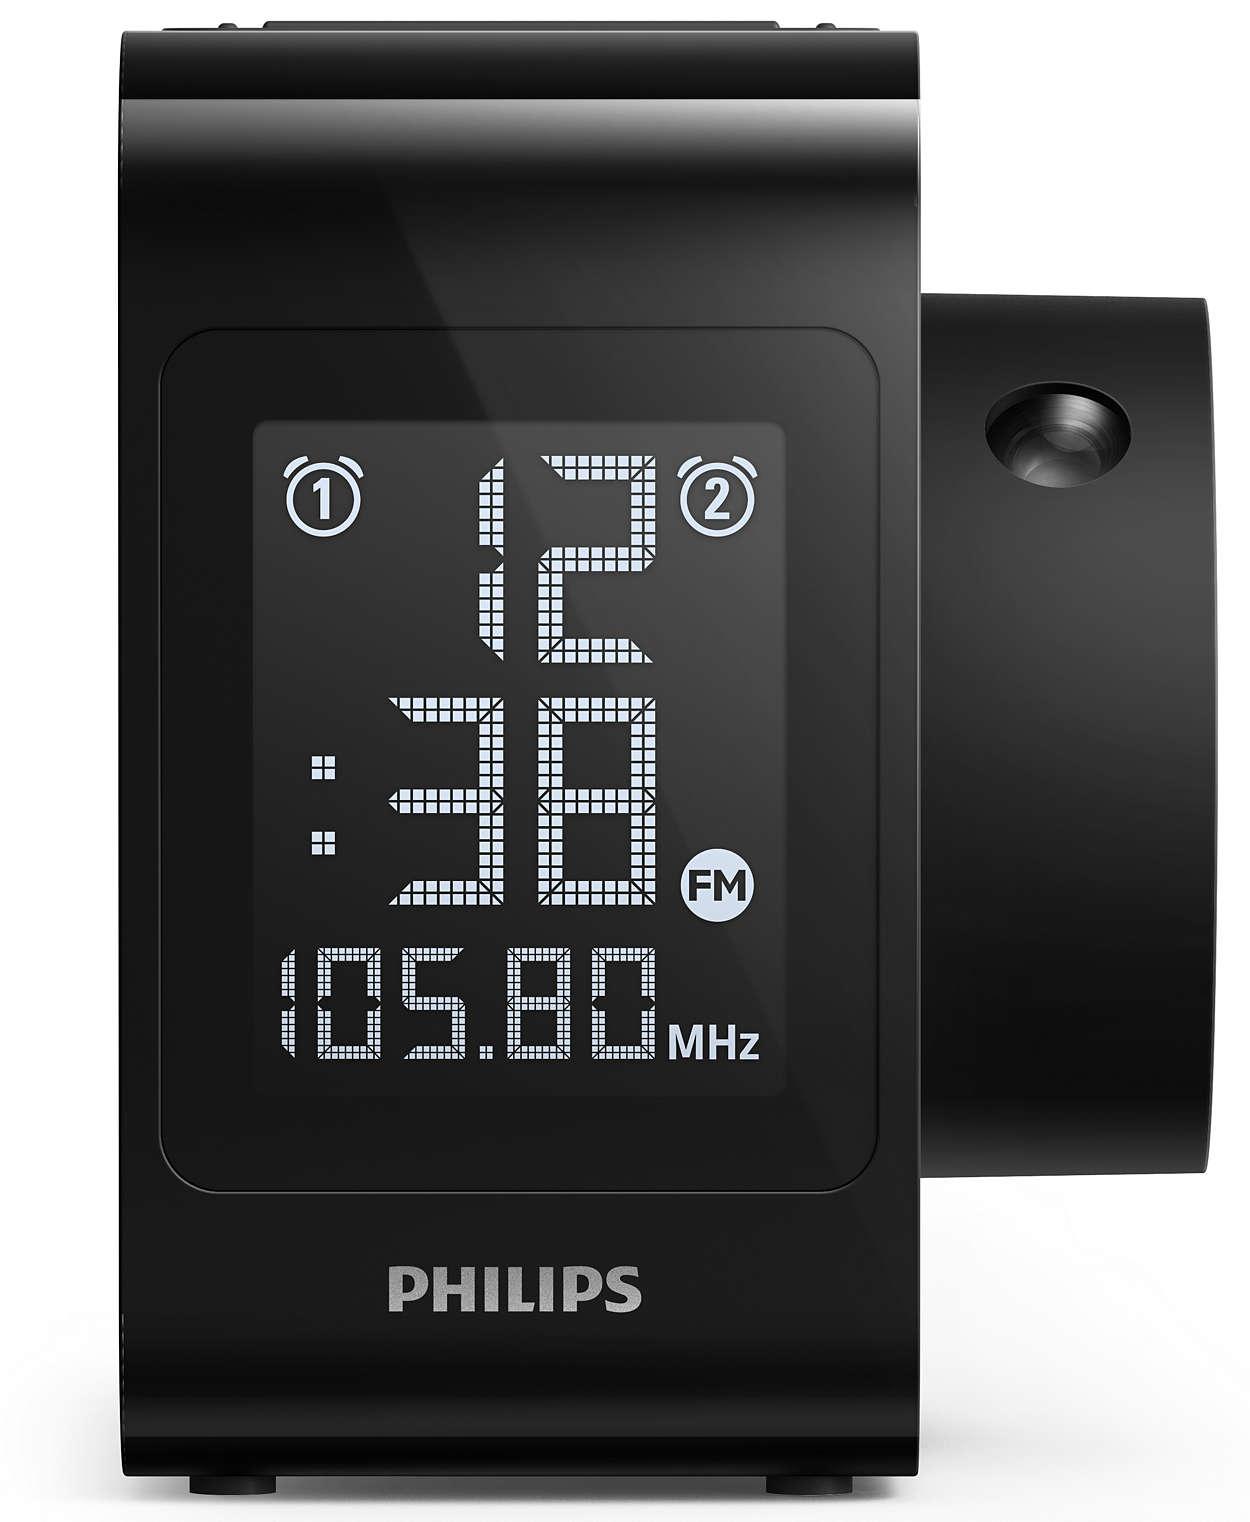 Radio-réveil AJ4800 12   Philips d1881d9f4fb3